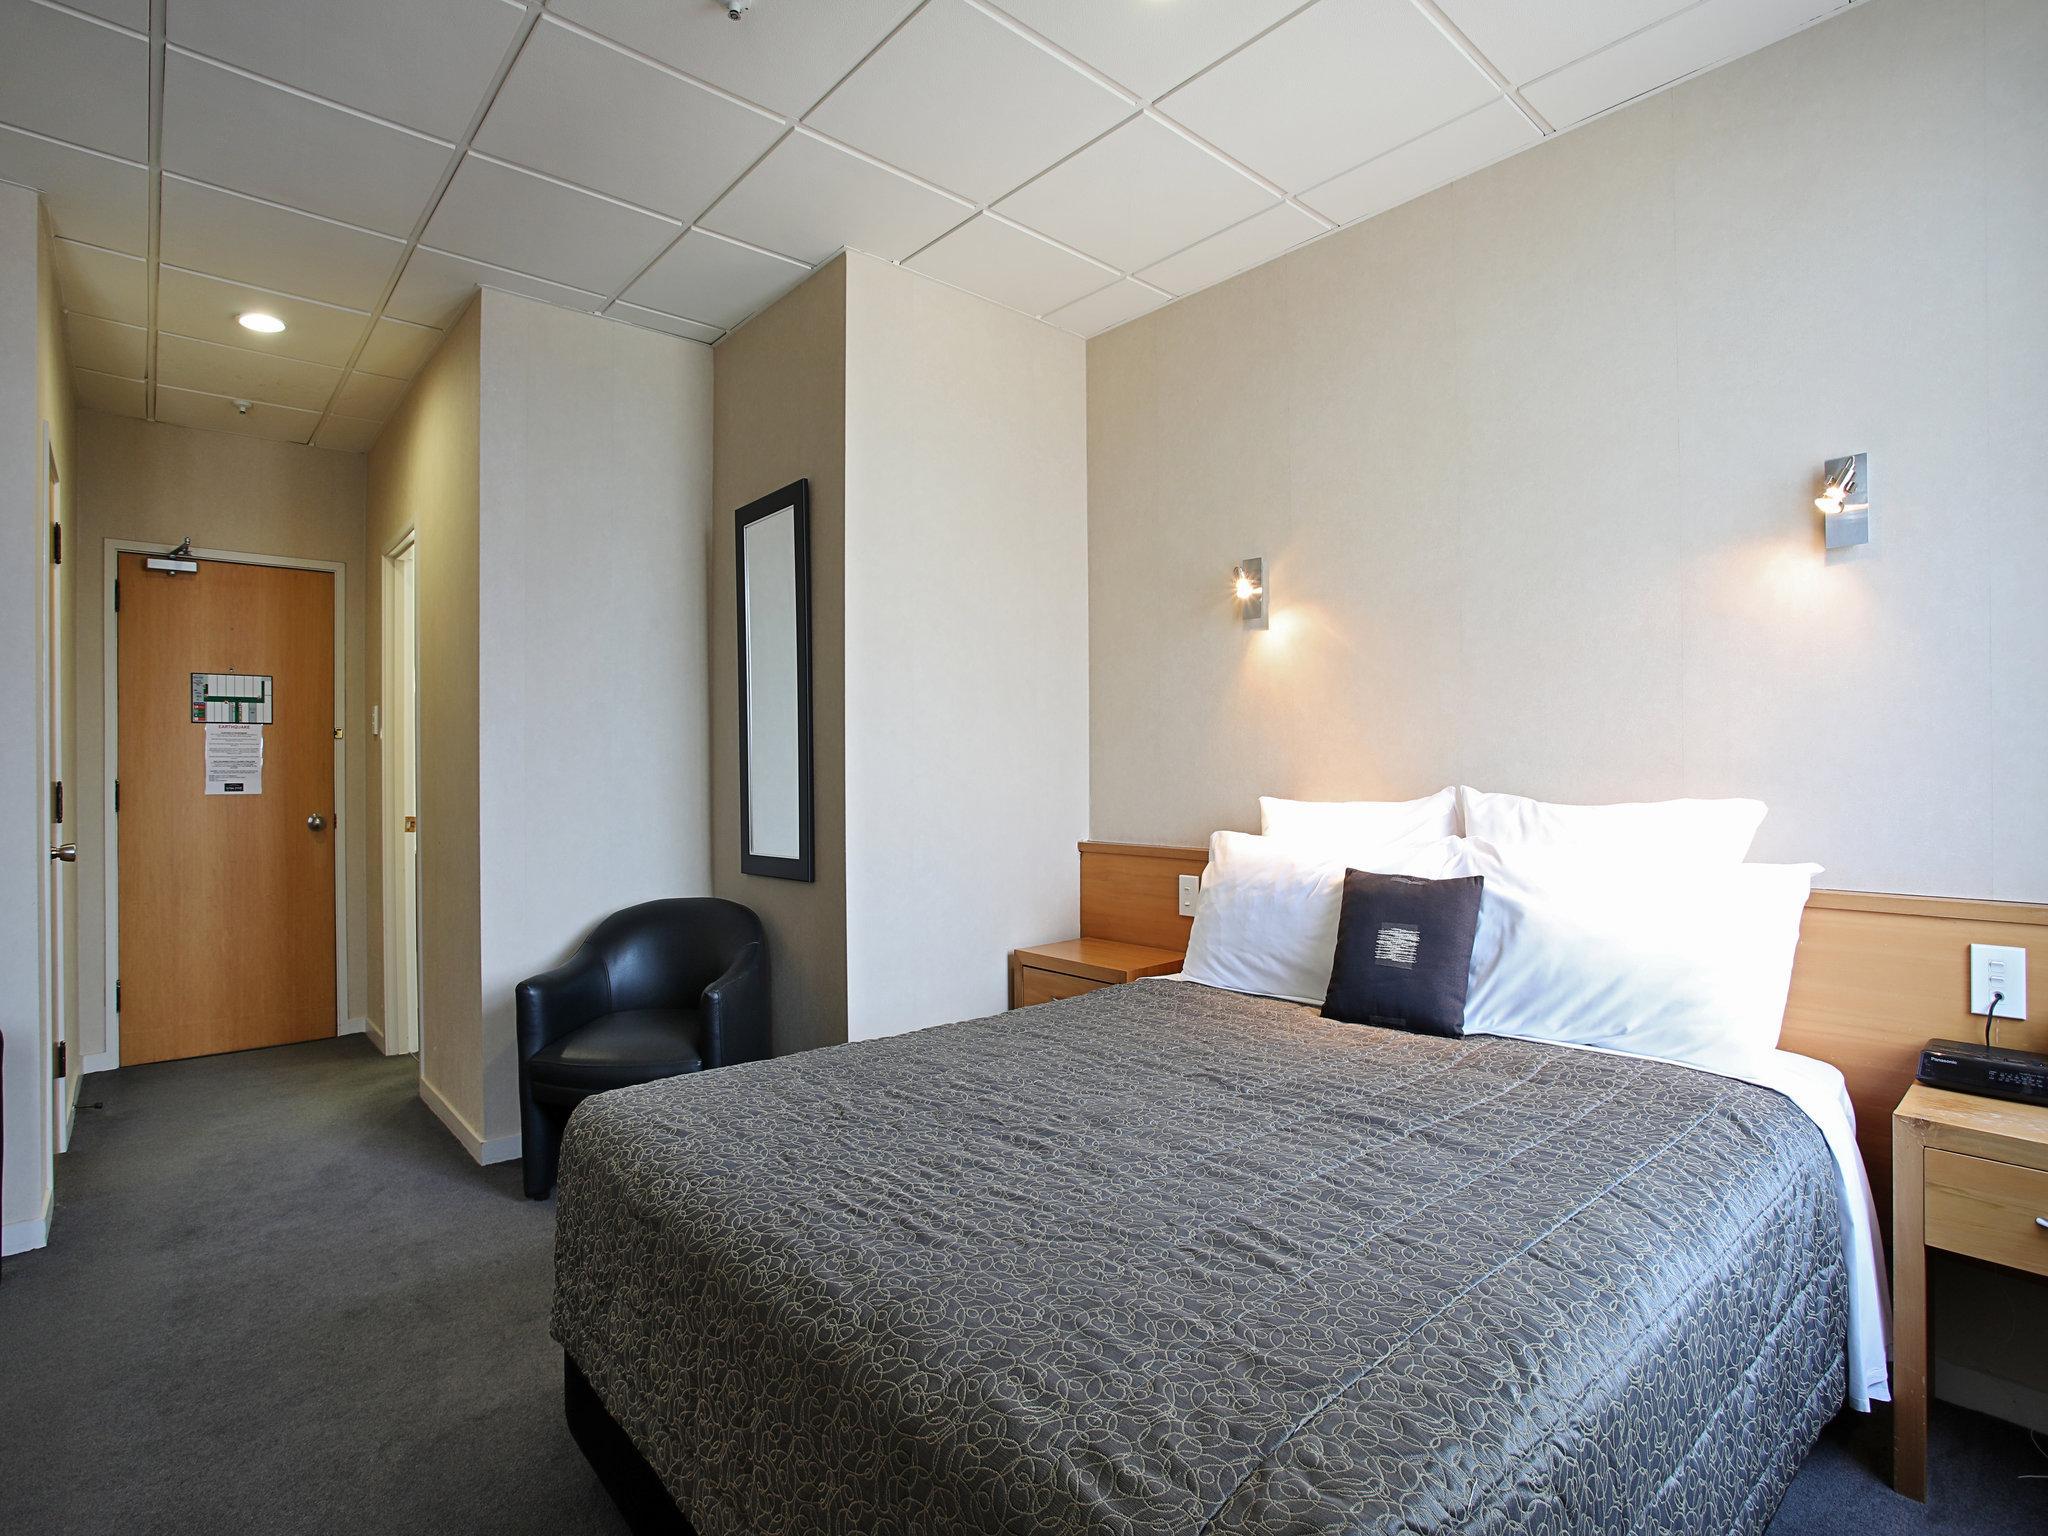 Kelvin Hotel, Invercargill